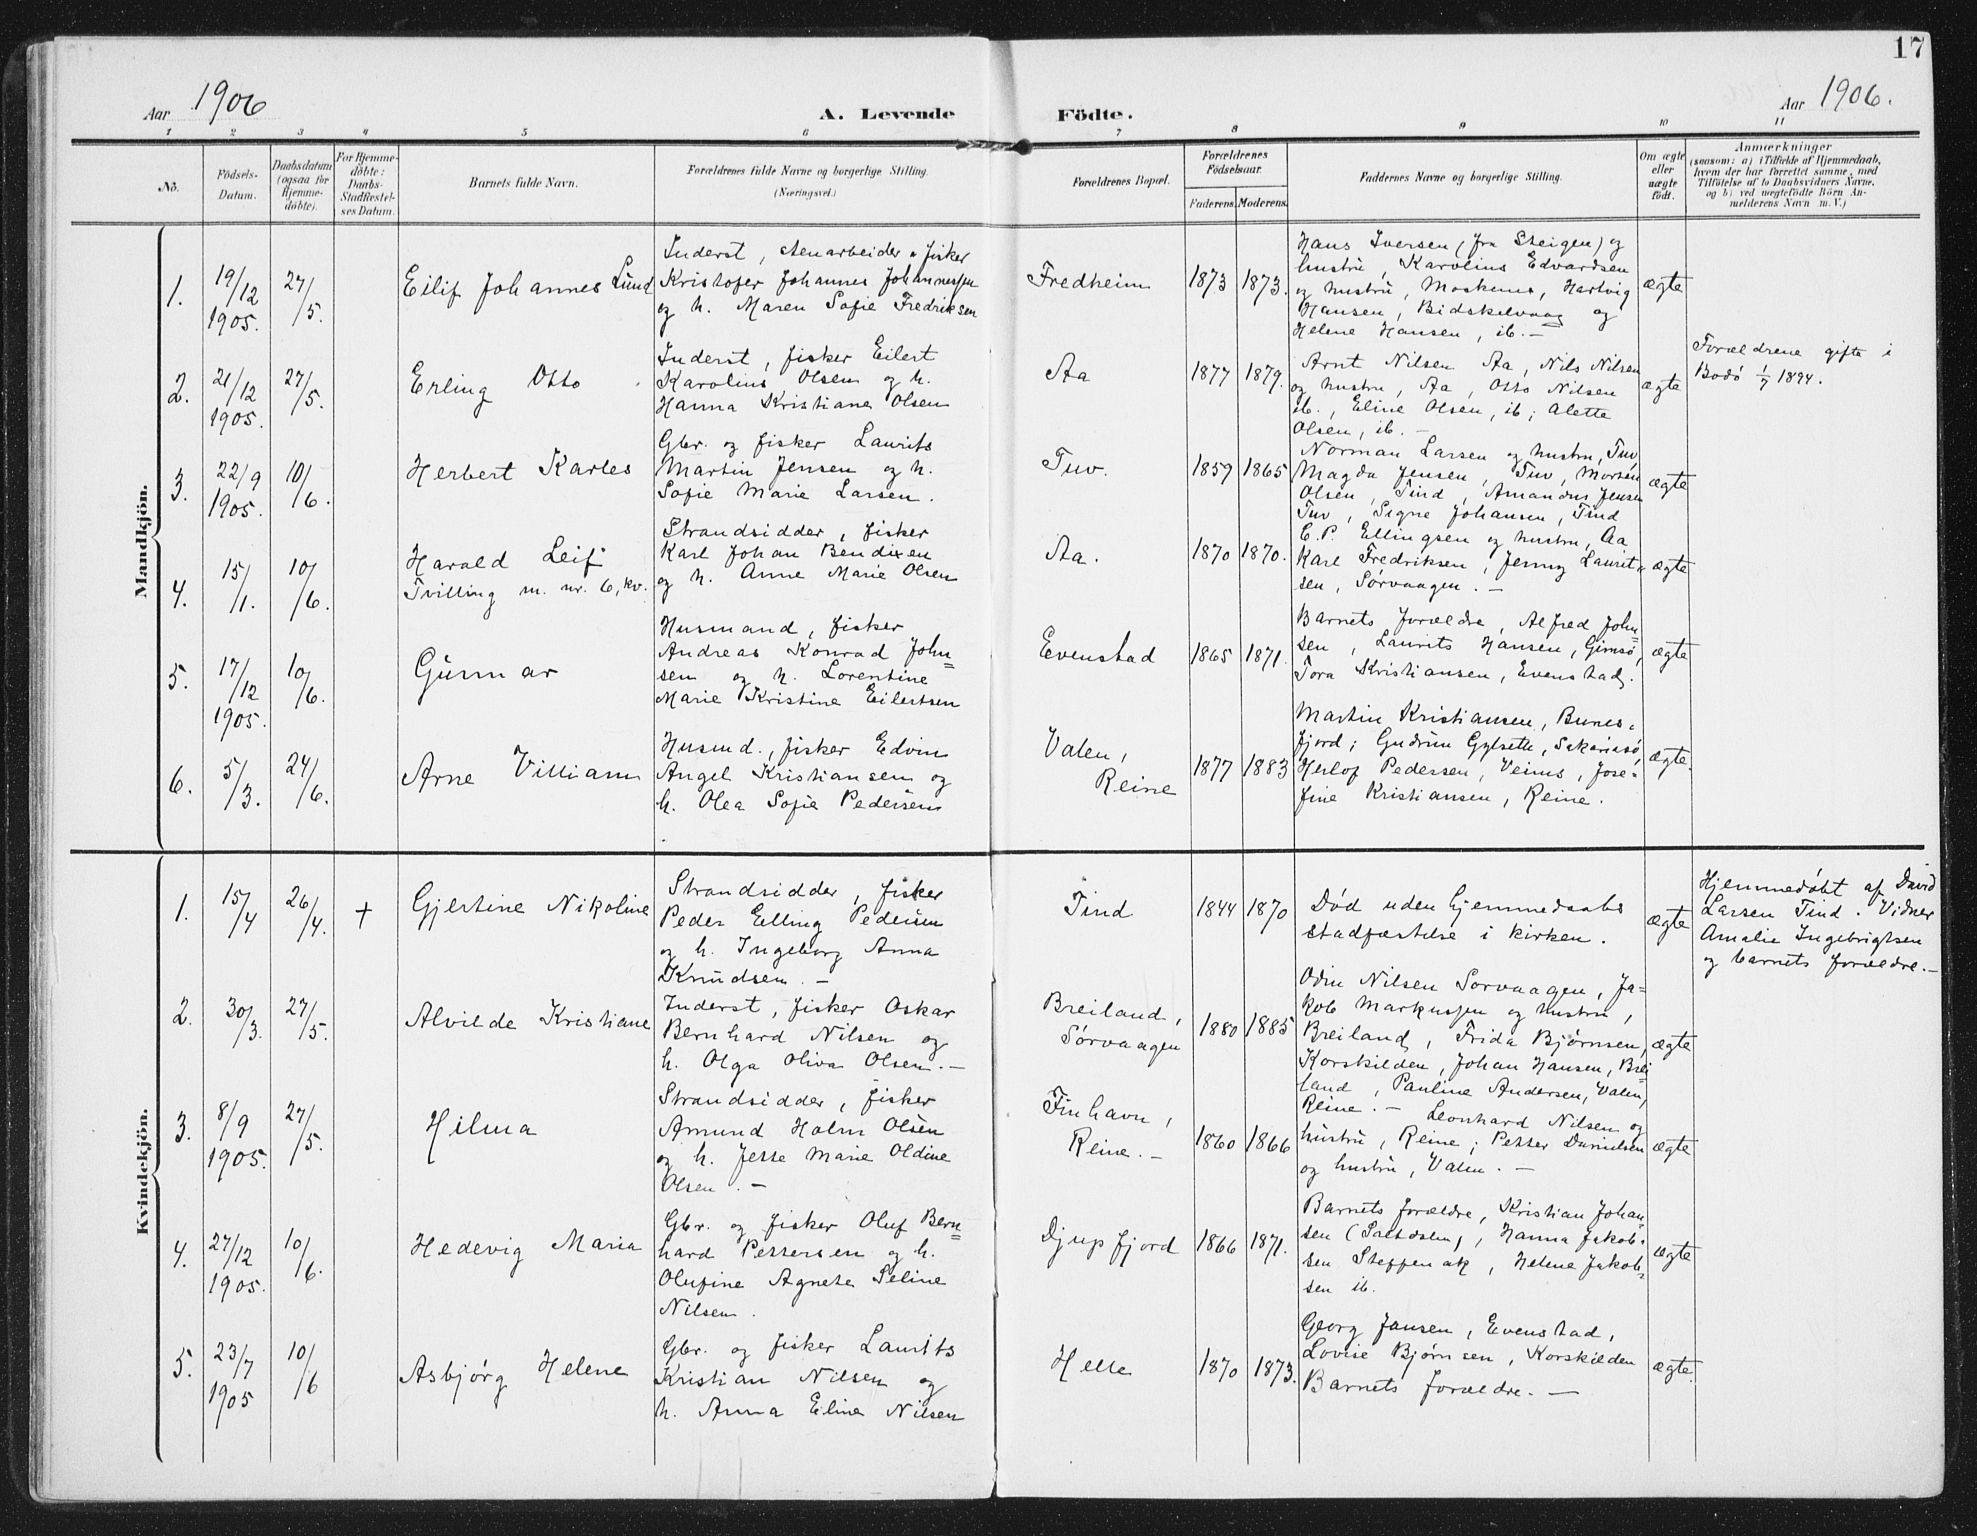 SAT, Ministerialprotokoller, klokkerbøker og fødselsregistre - Nordland, 886/L1221: Ministerialbok nr. 886A03, 1903-1913, s. 17